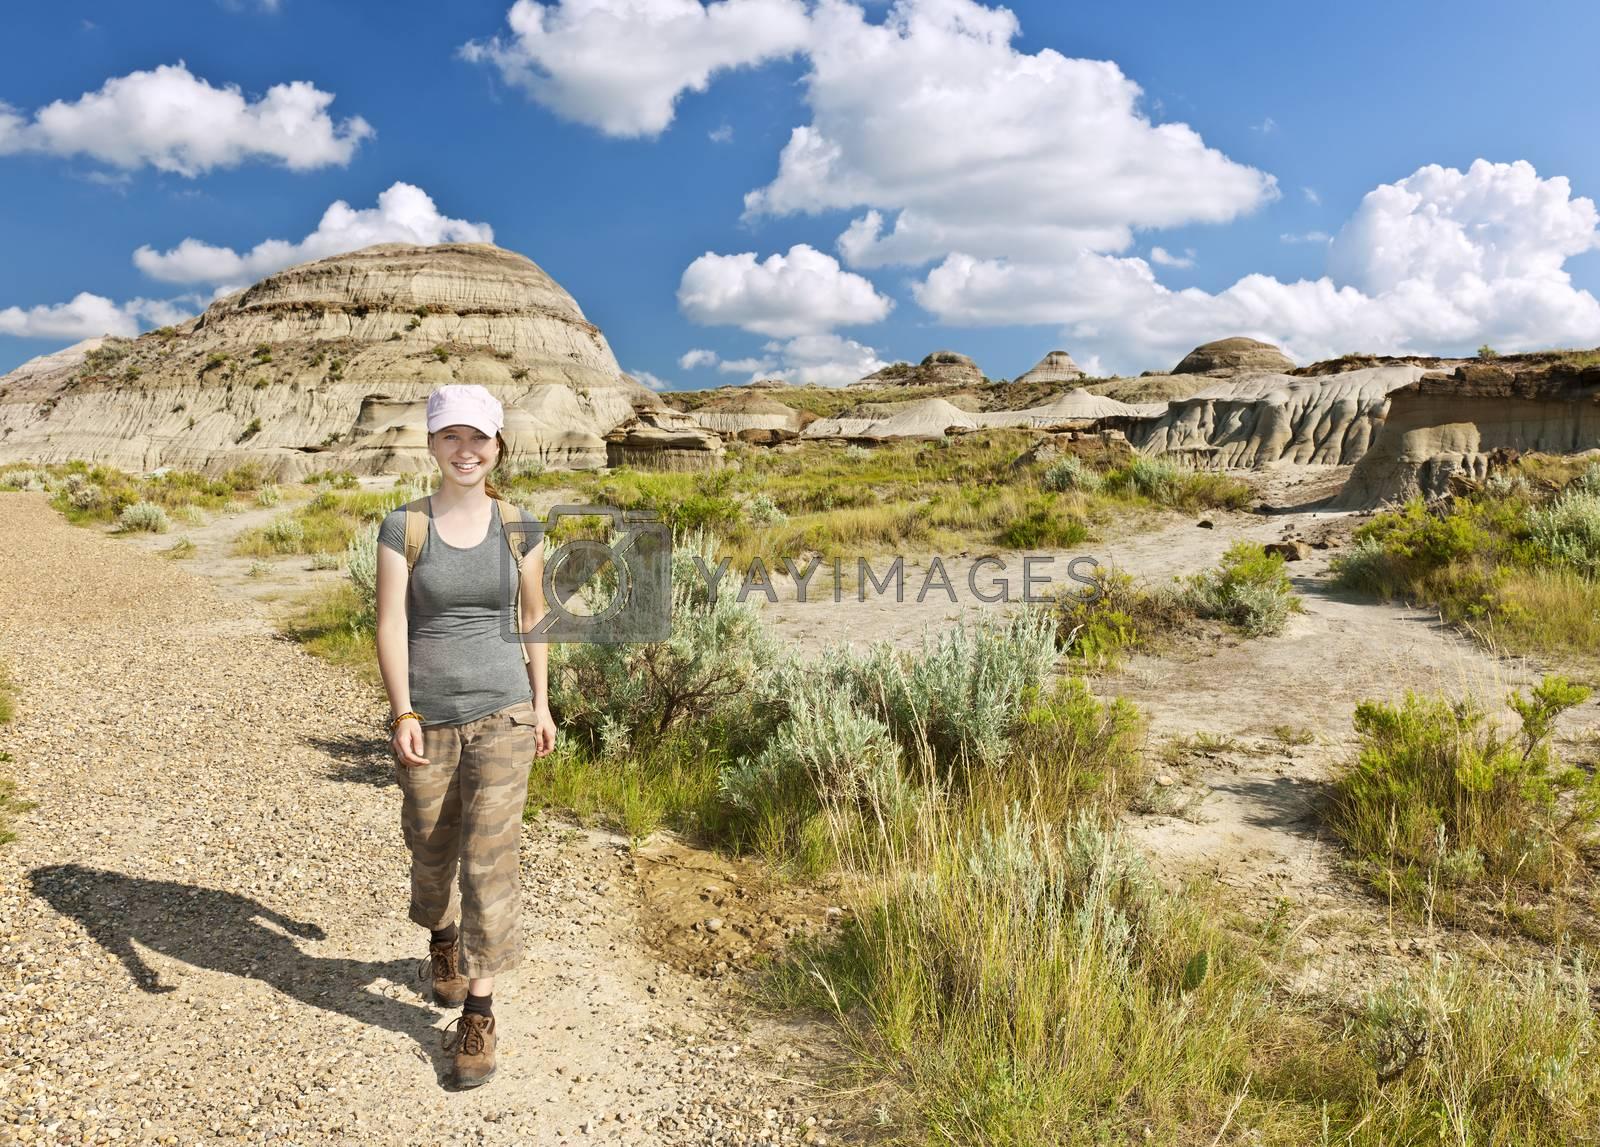 Happy girl hiking the Badlands in Dinosaur provincial park, Alberta, Canada